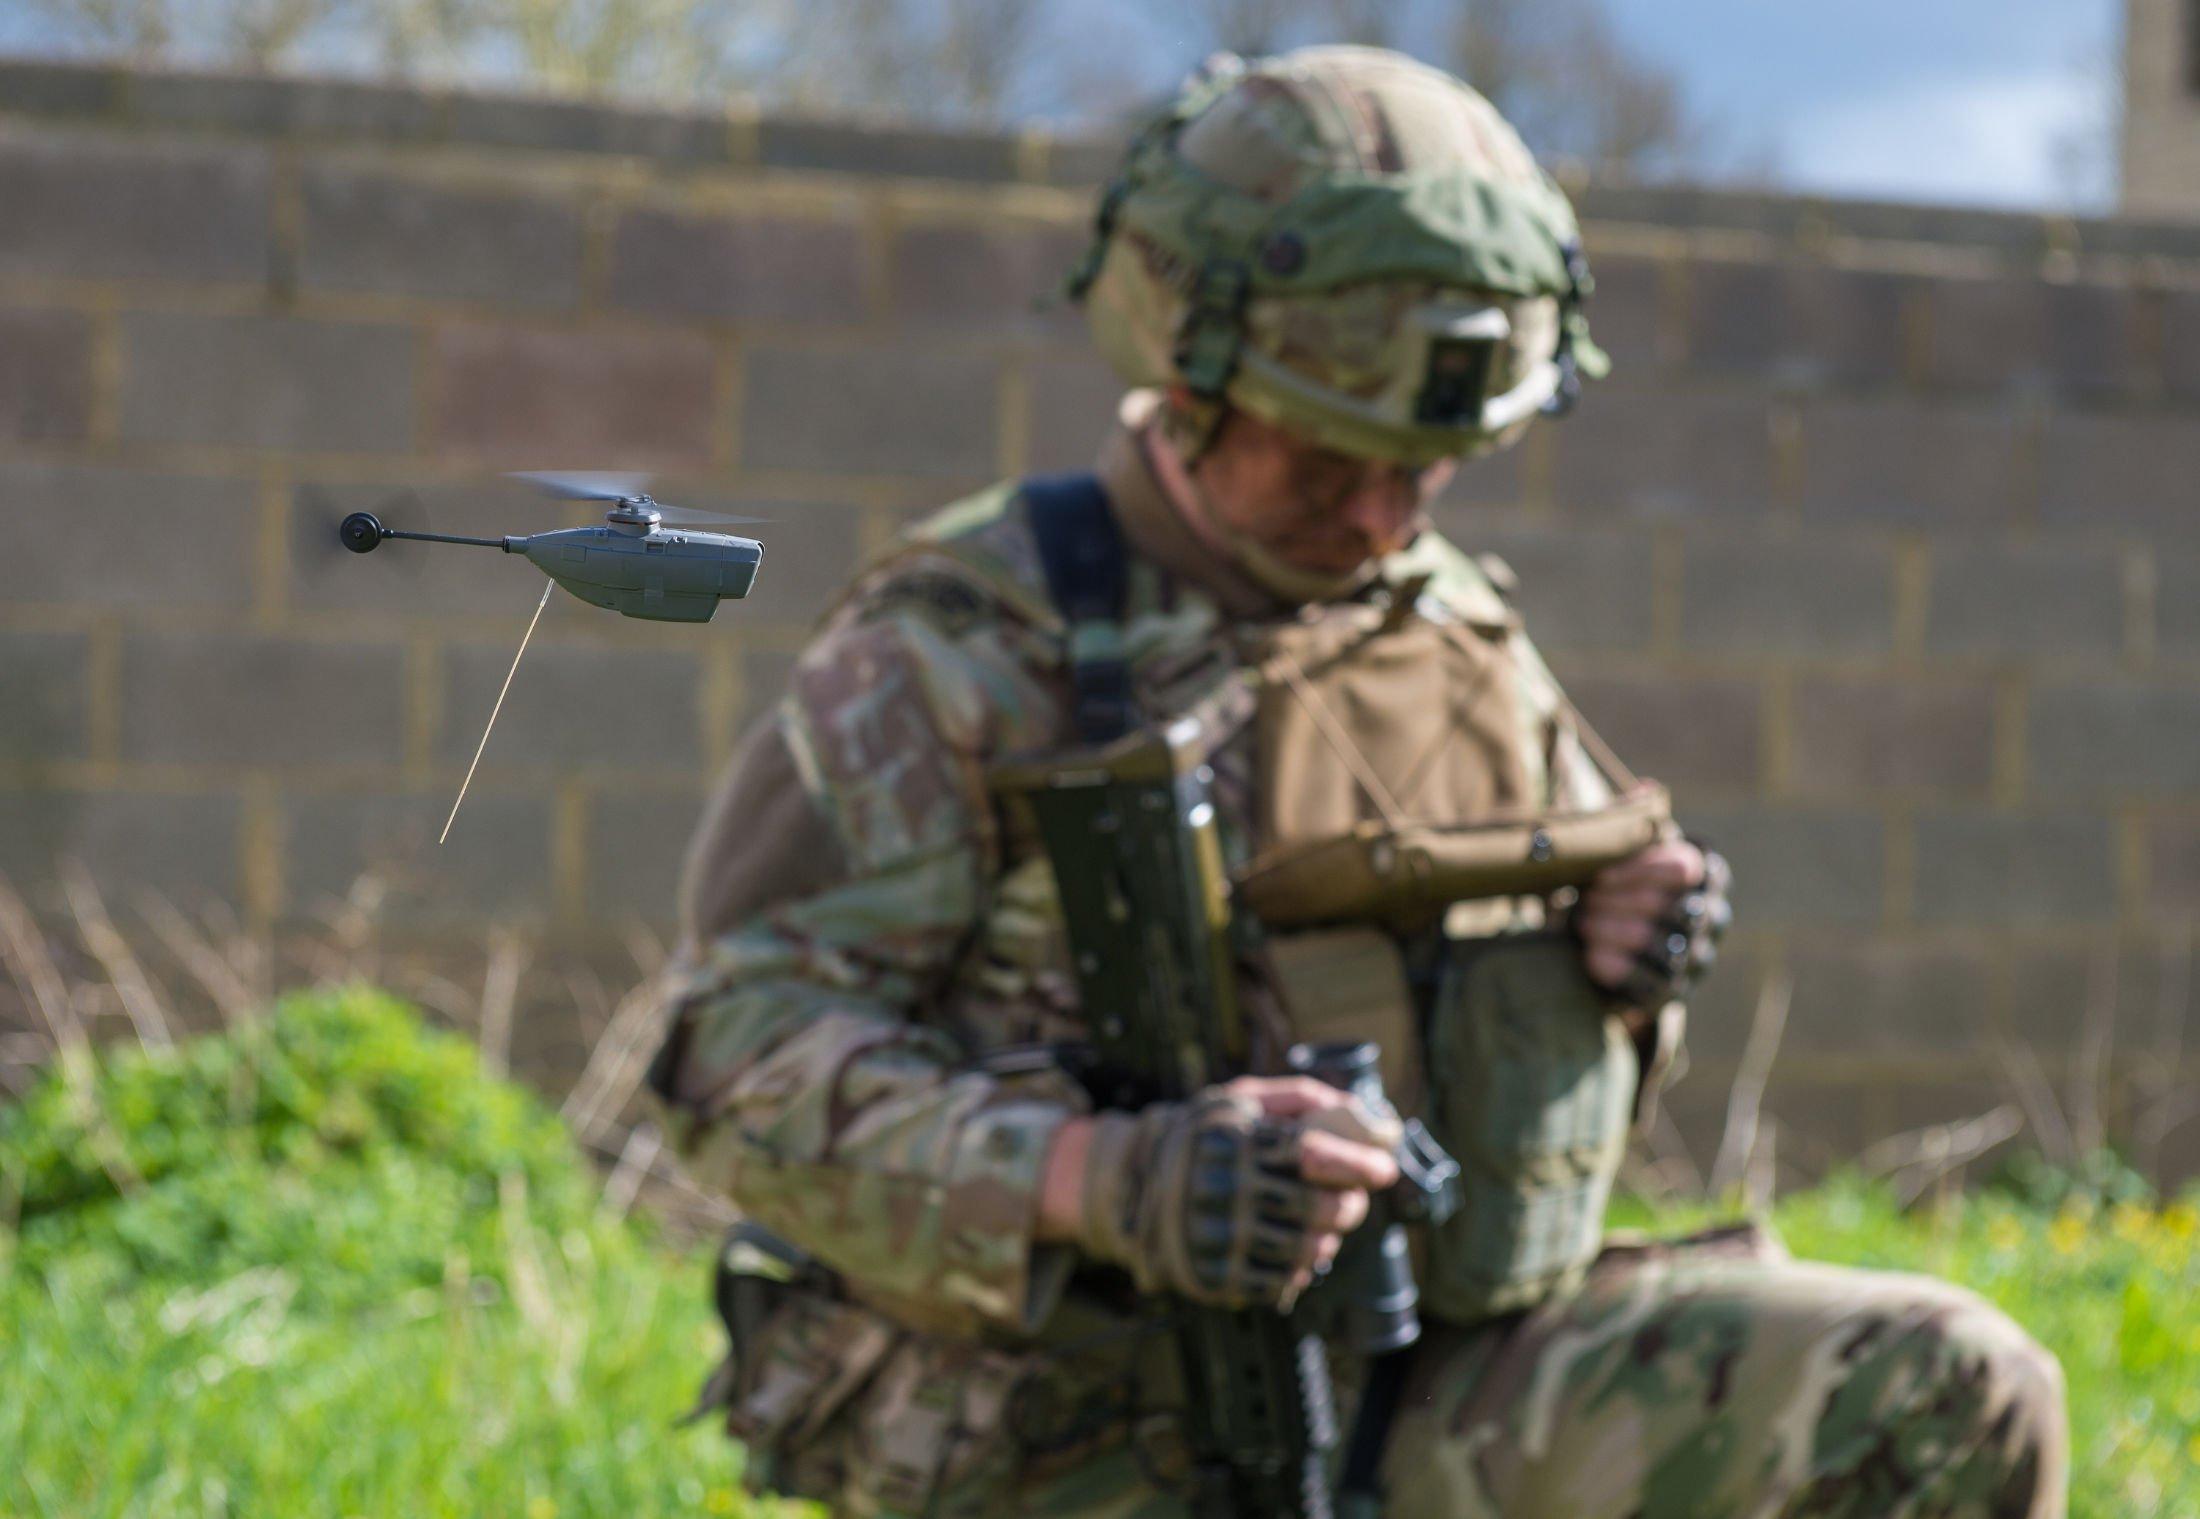 Black Hornet 2 Drohne der Royal Marine UK